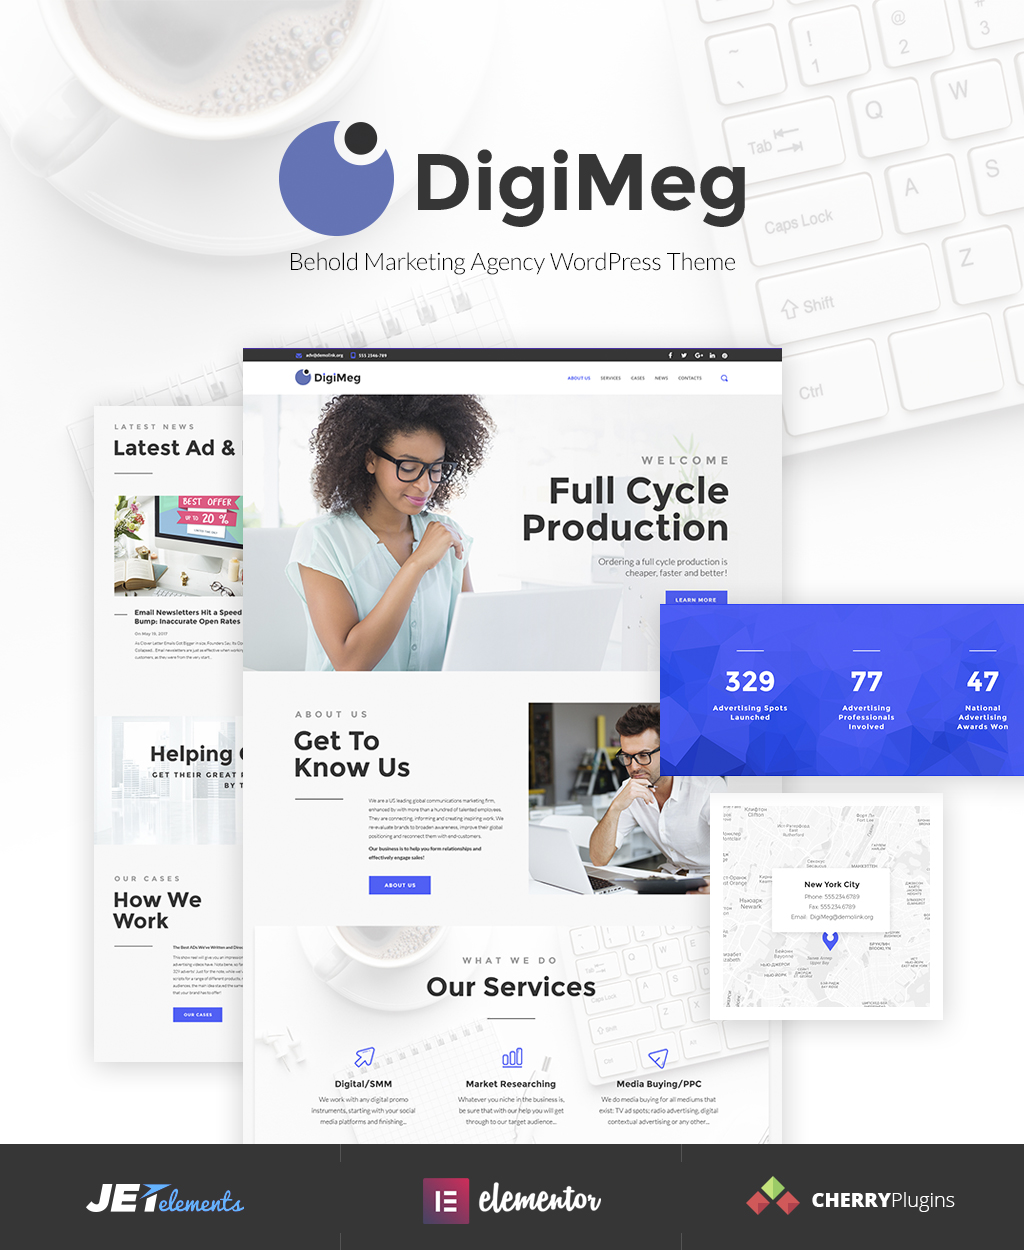 DigiMeg - Communication Agency Wordpress Theme WordPress Theme